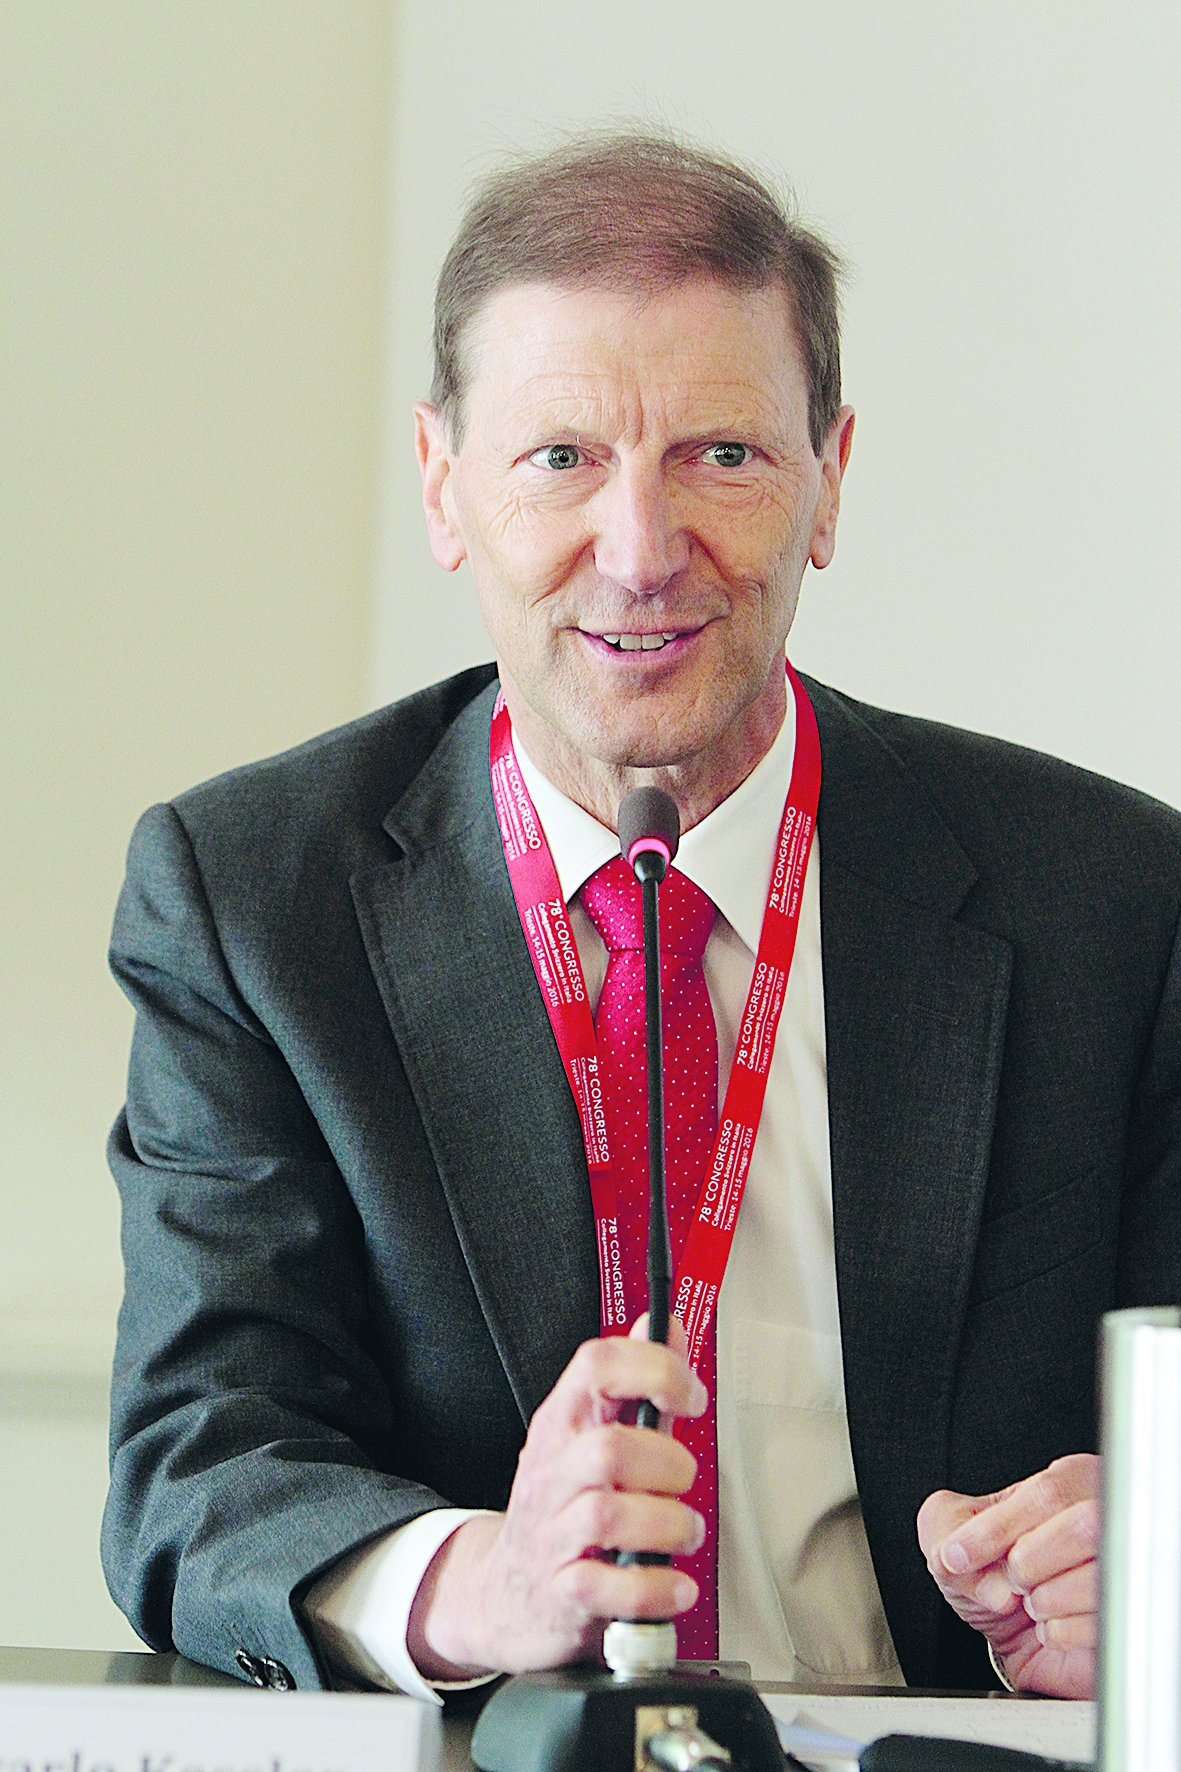 Giancarlo Kessler